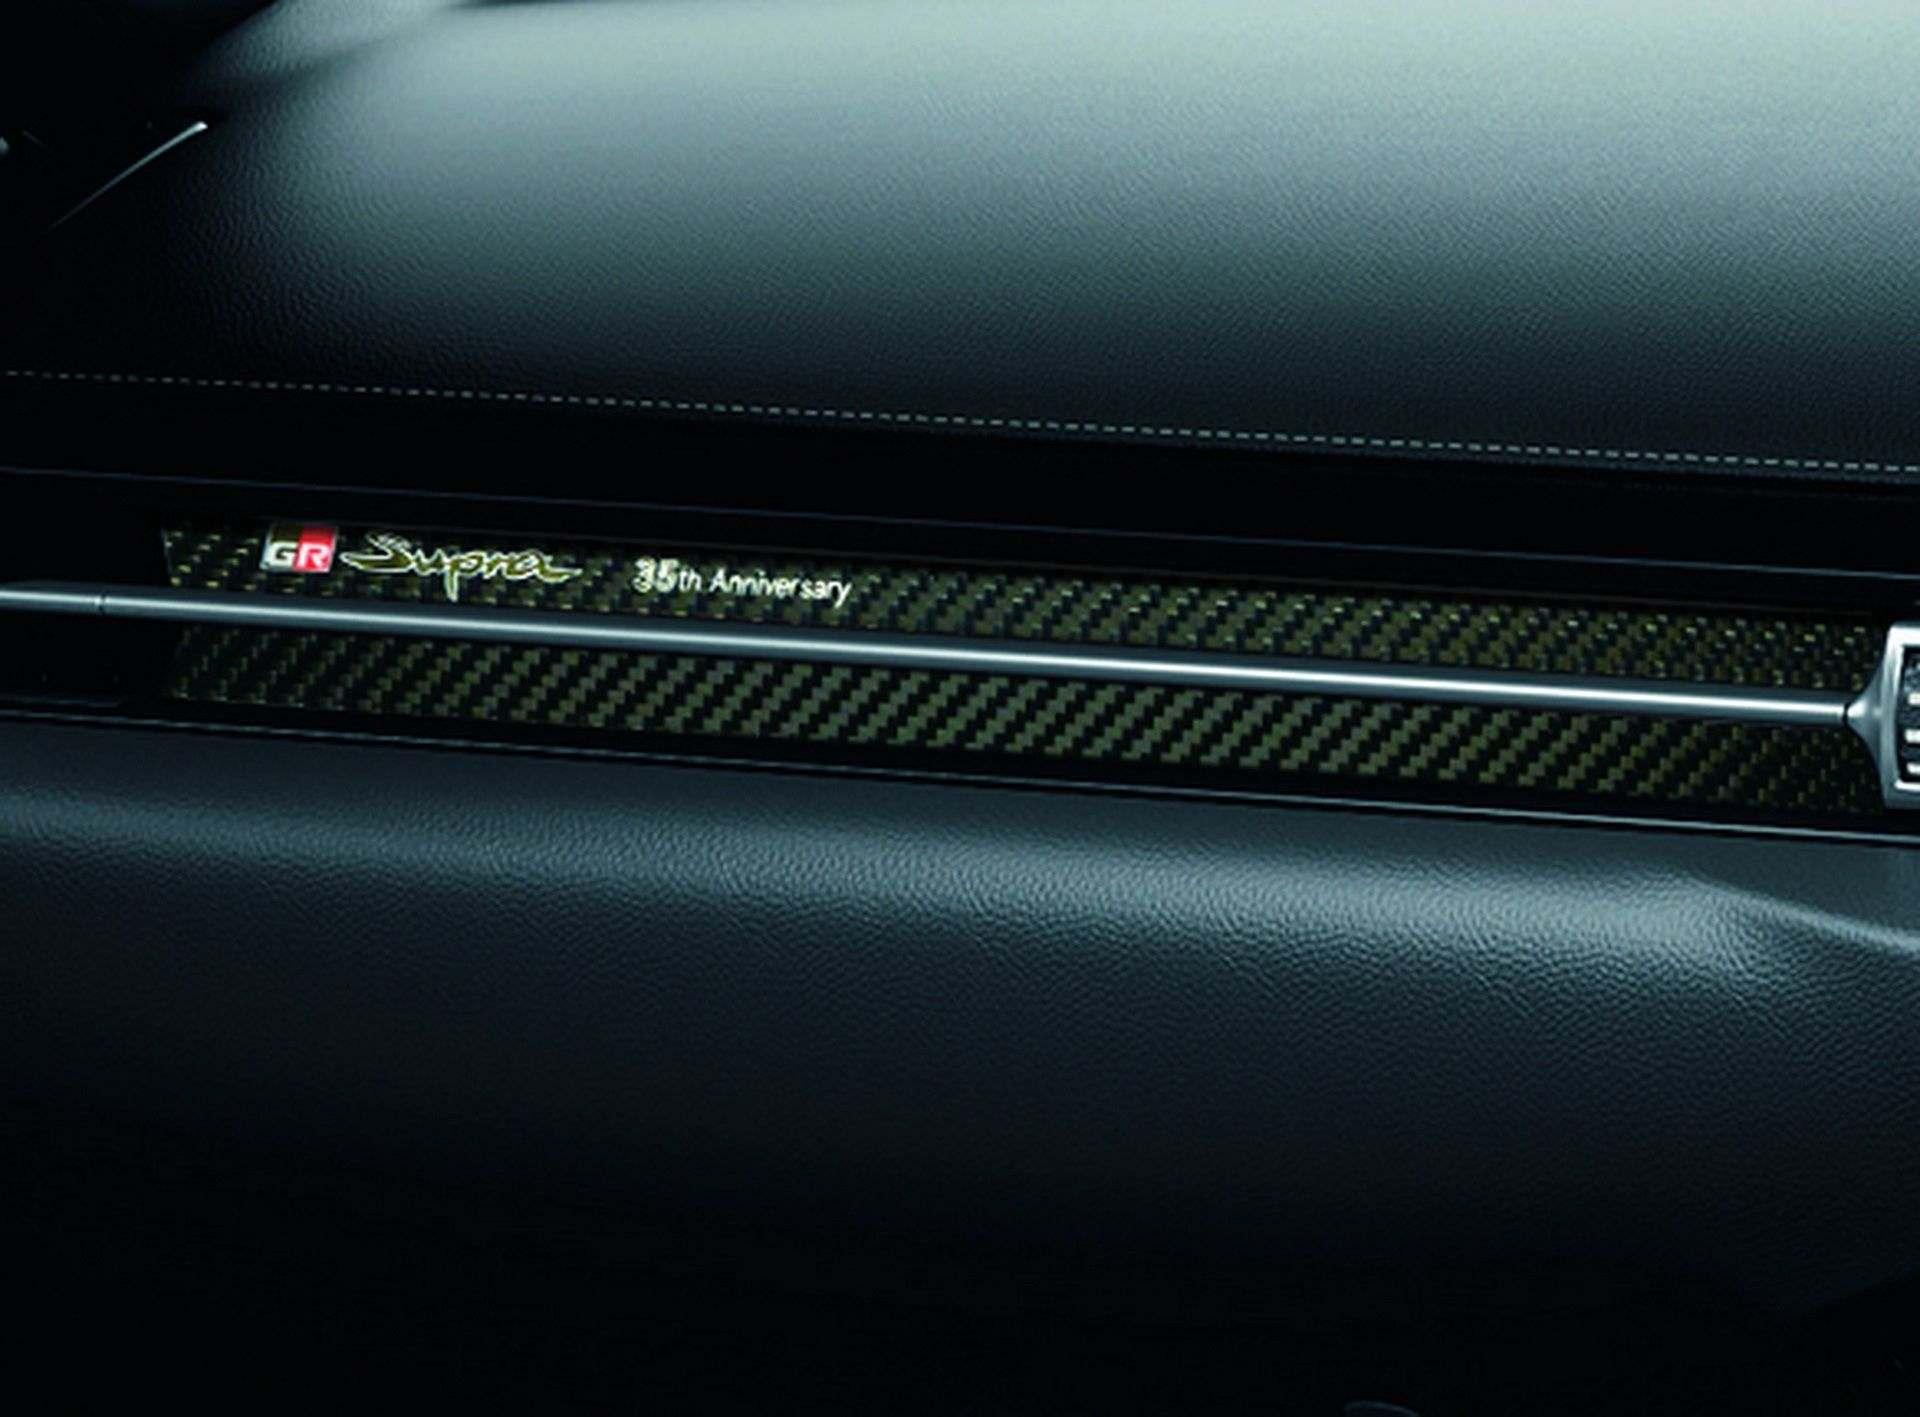 Toyota_GR_Supra_35th_Anniversary_Edition-0004